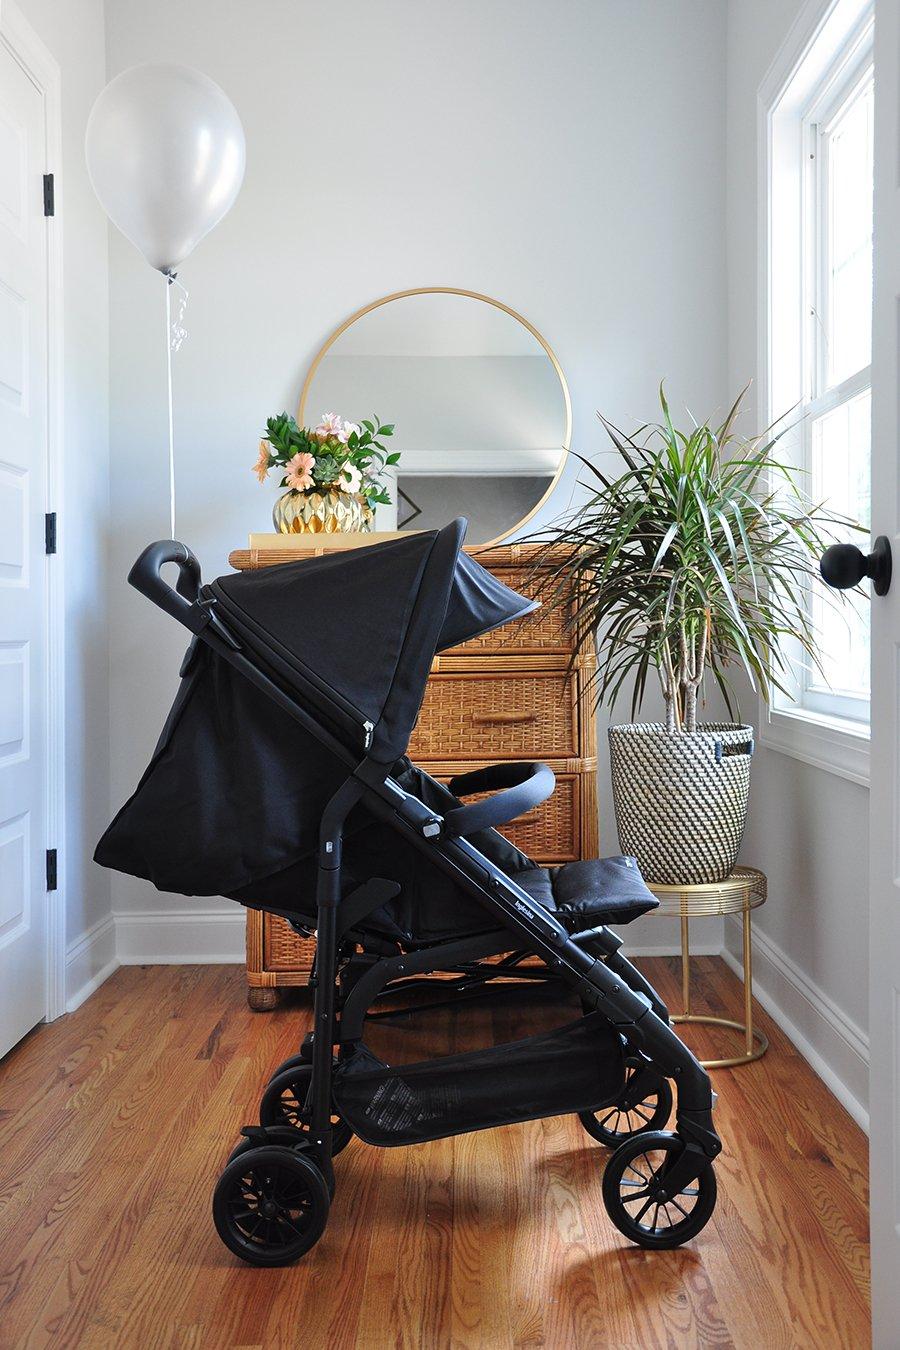 How to Choose a Stroller (& Why I Chose Inglesina Zippy Light)